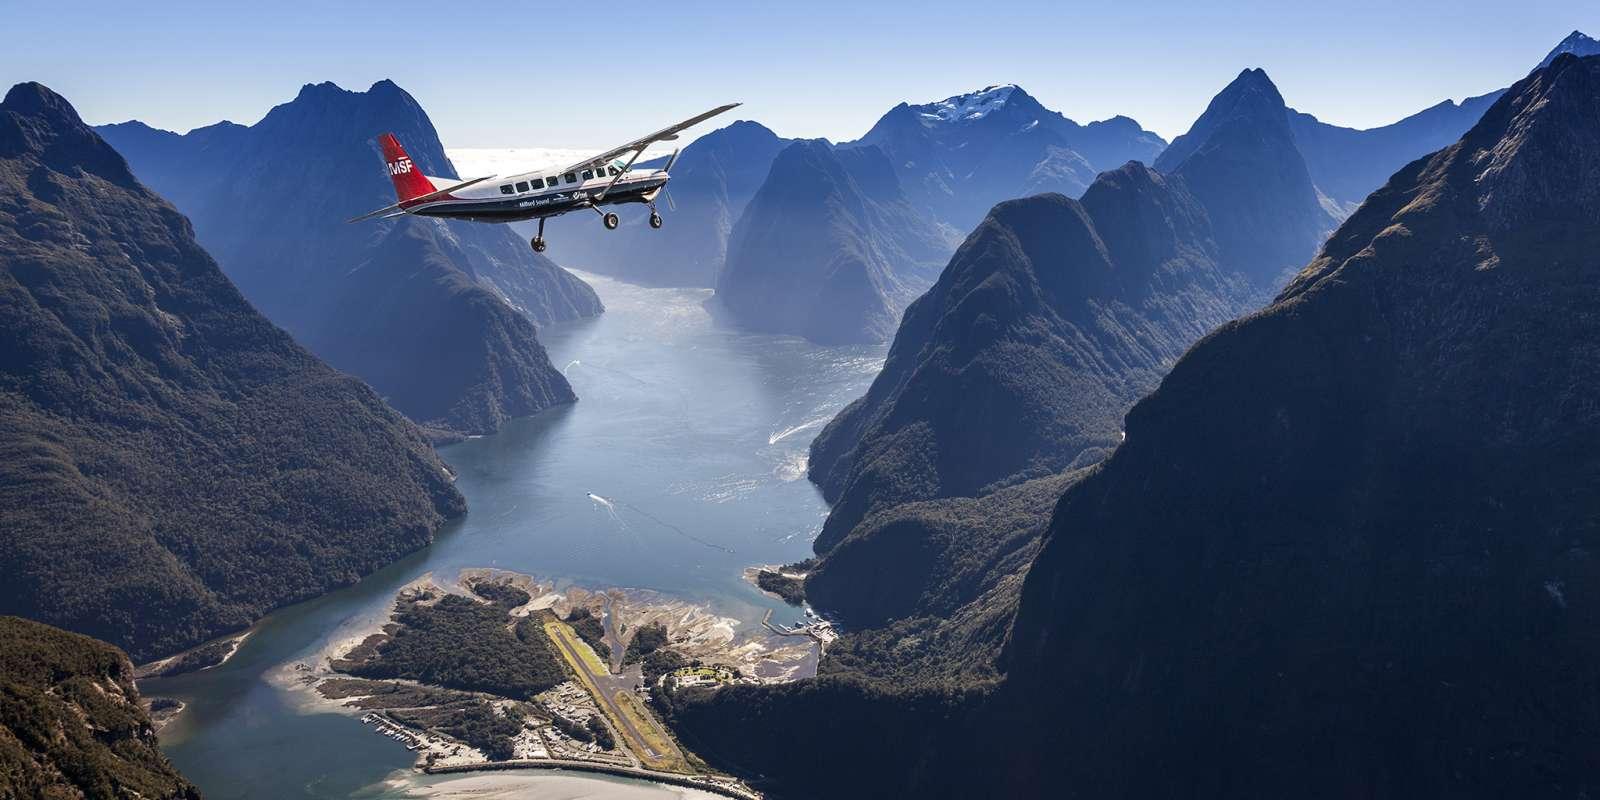 Milford Sound by plane